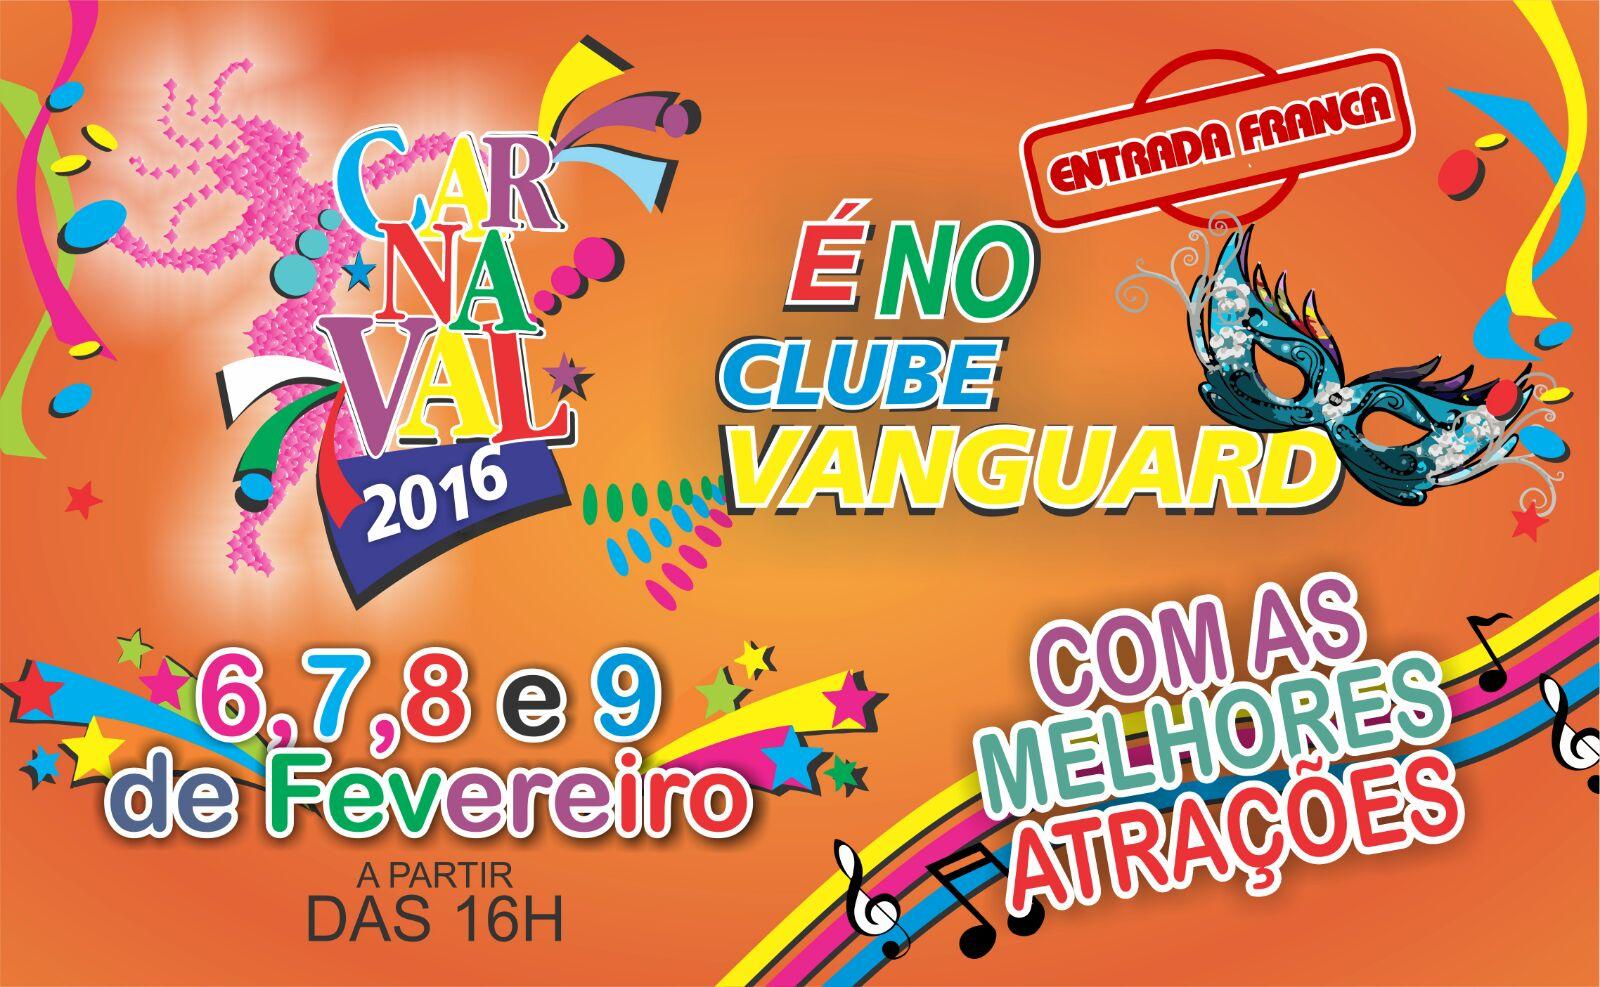 CARNAVAL 2016